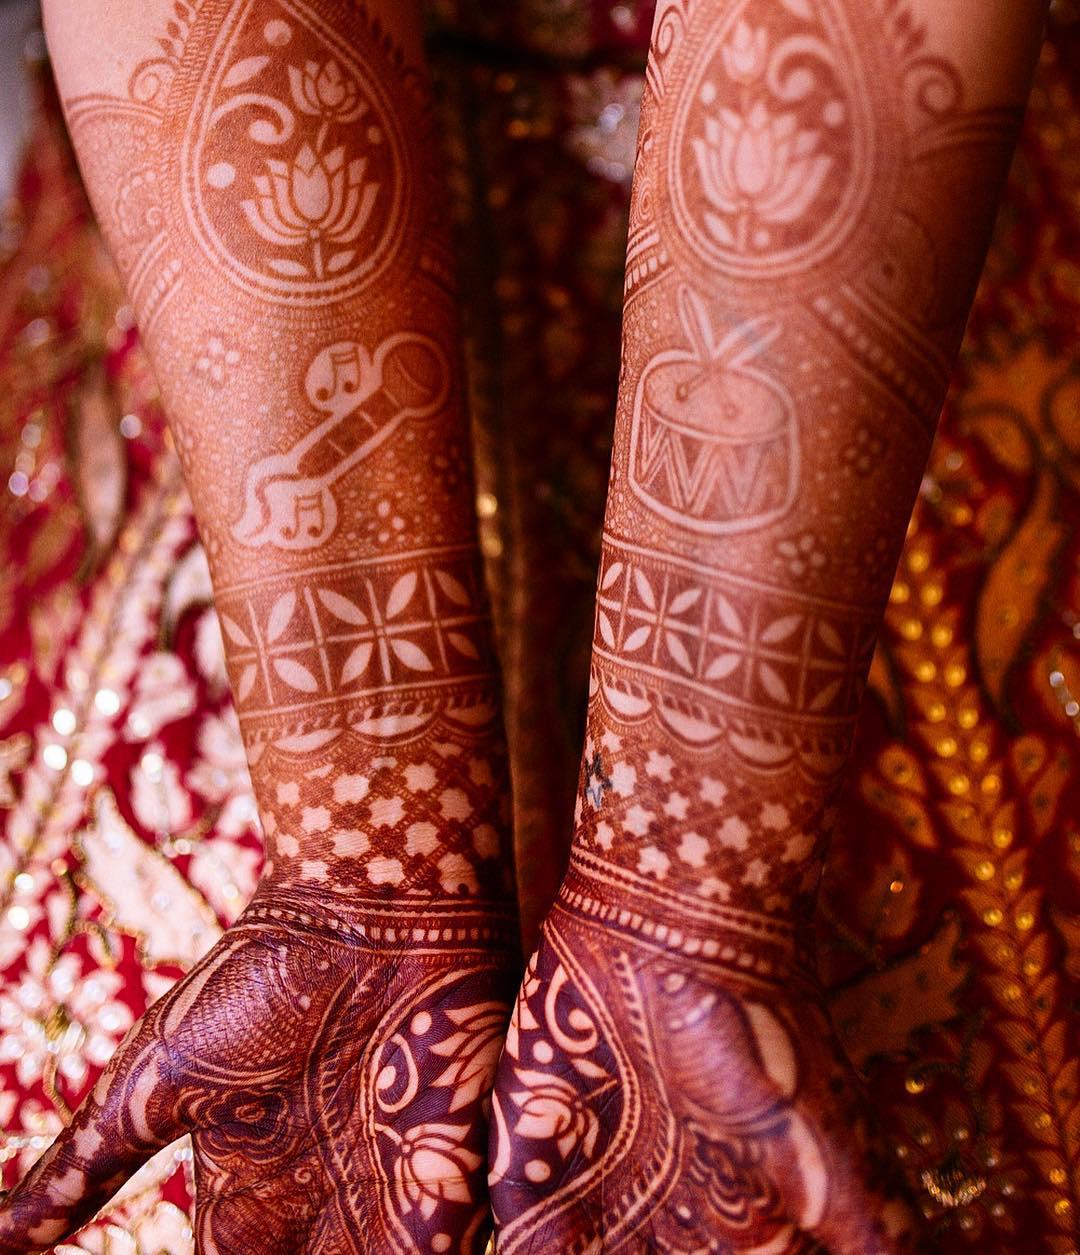 Hands Mehendi Design, Mehendi, Karva Chauth